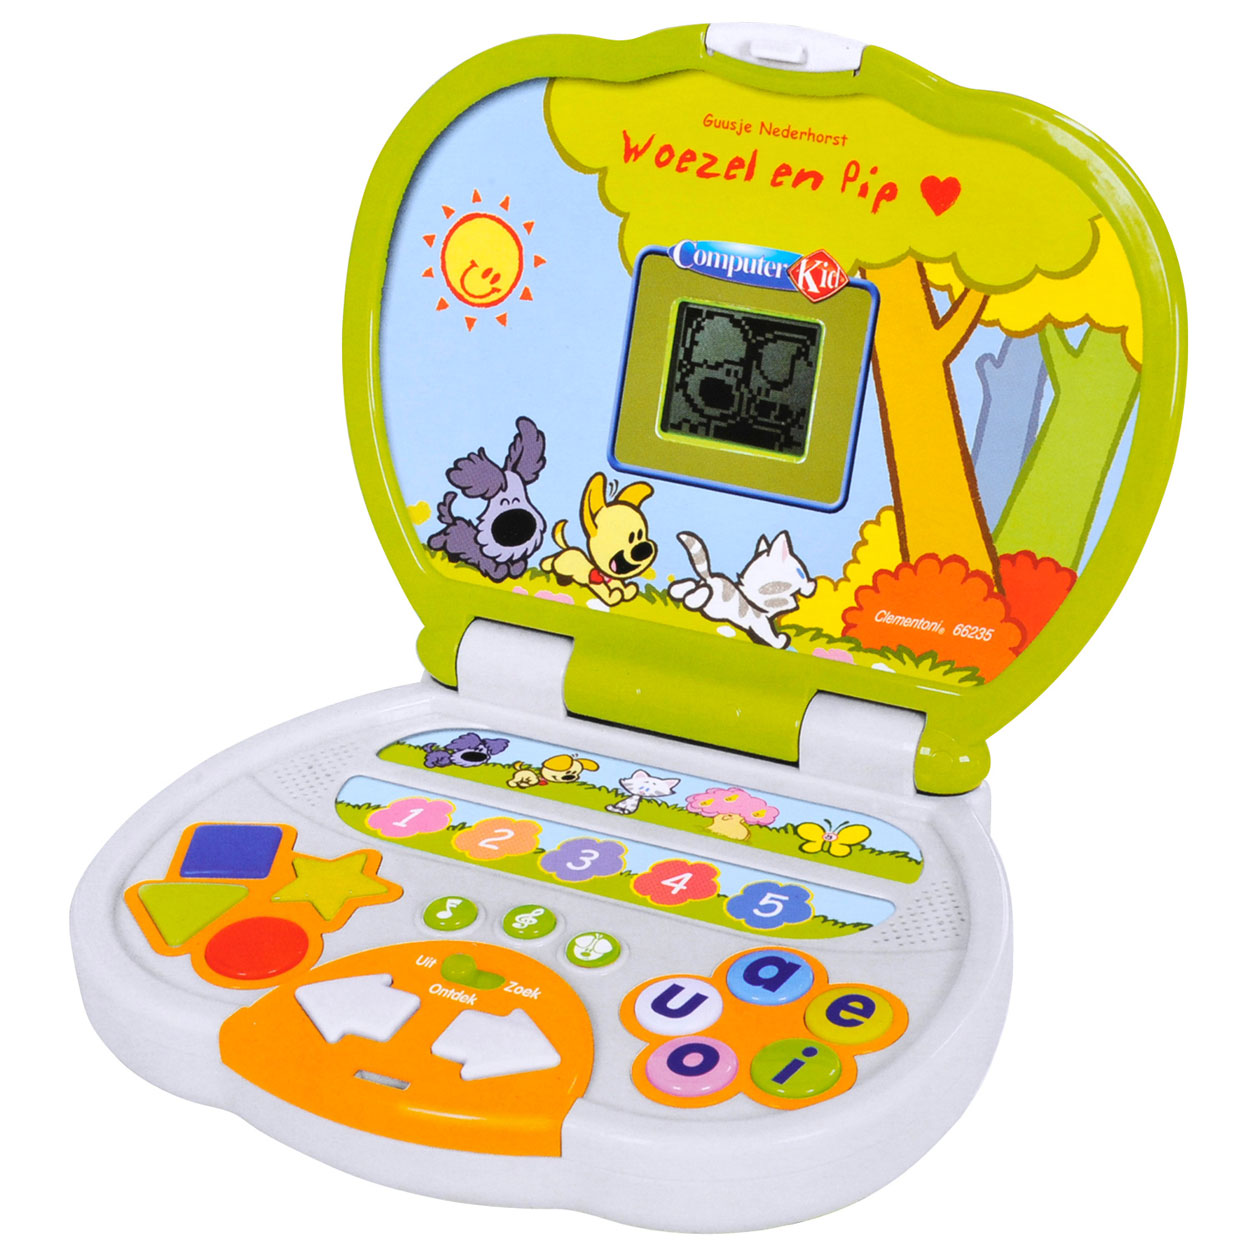 Goede Woezel en Pip Laptop online kopen | Lobbes Speelgoed TO-89